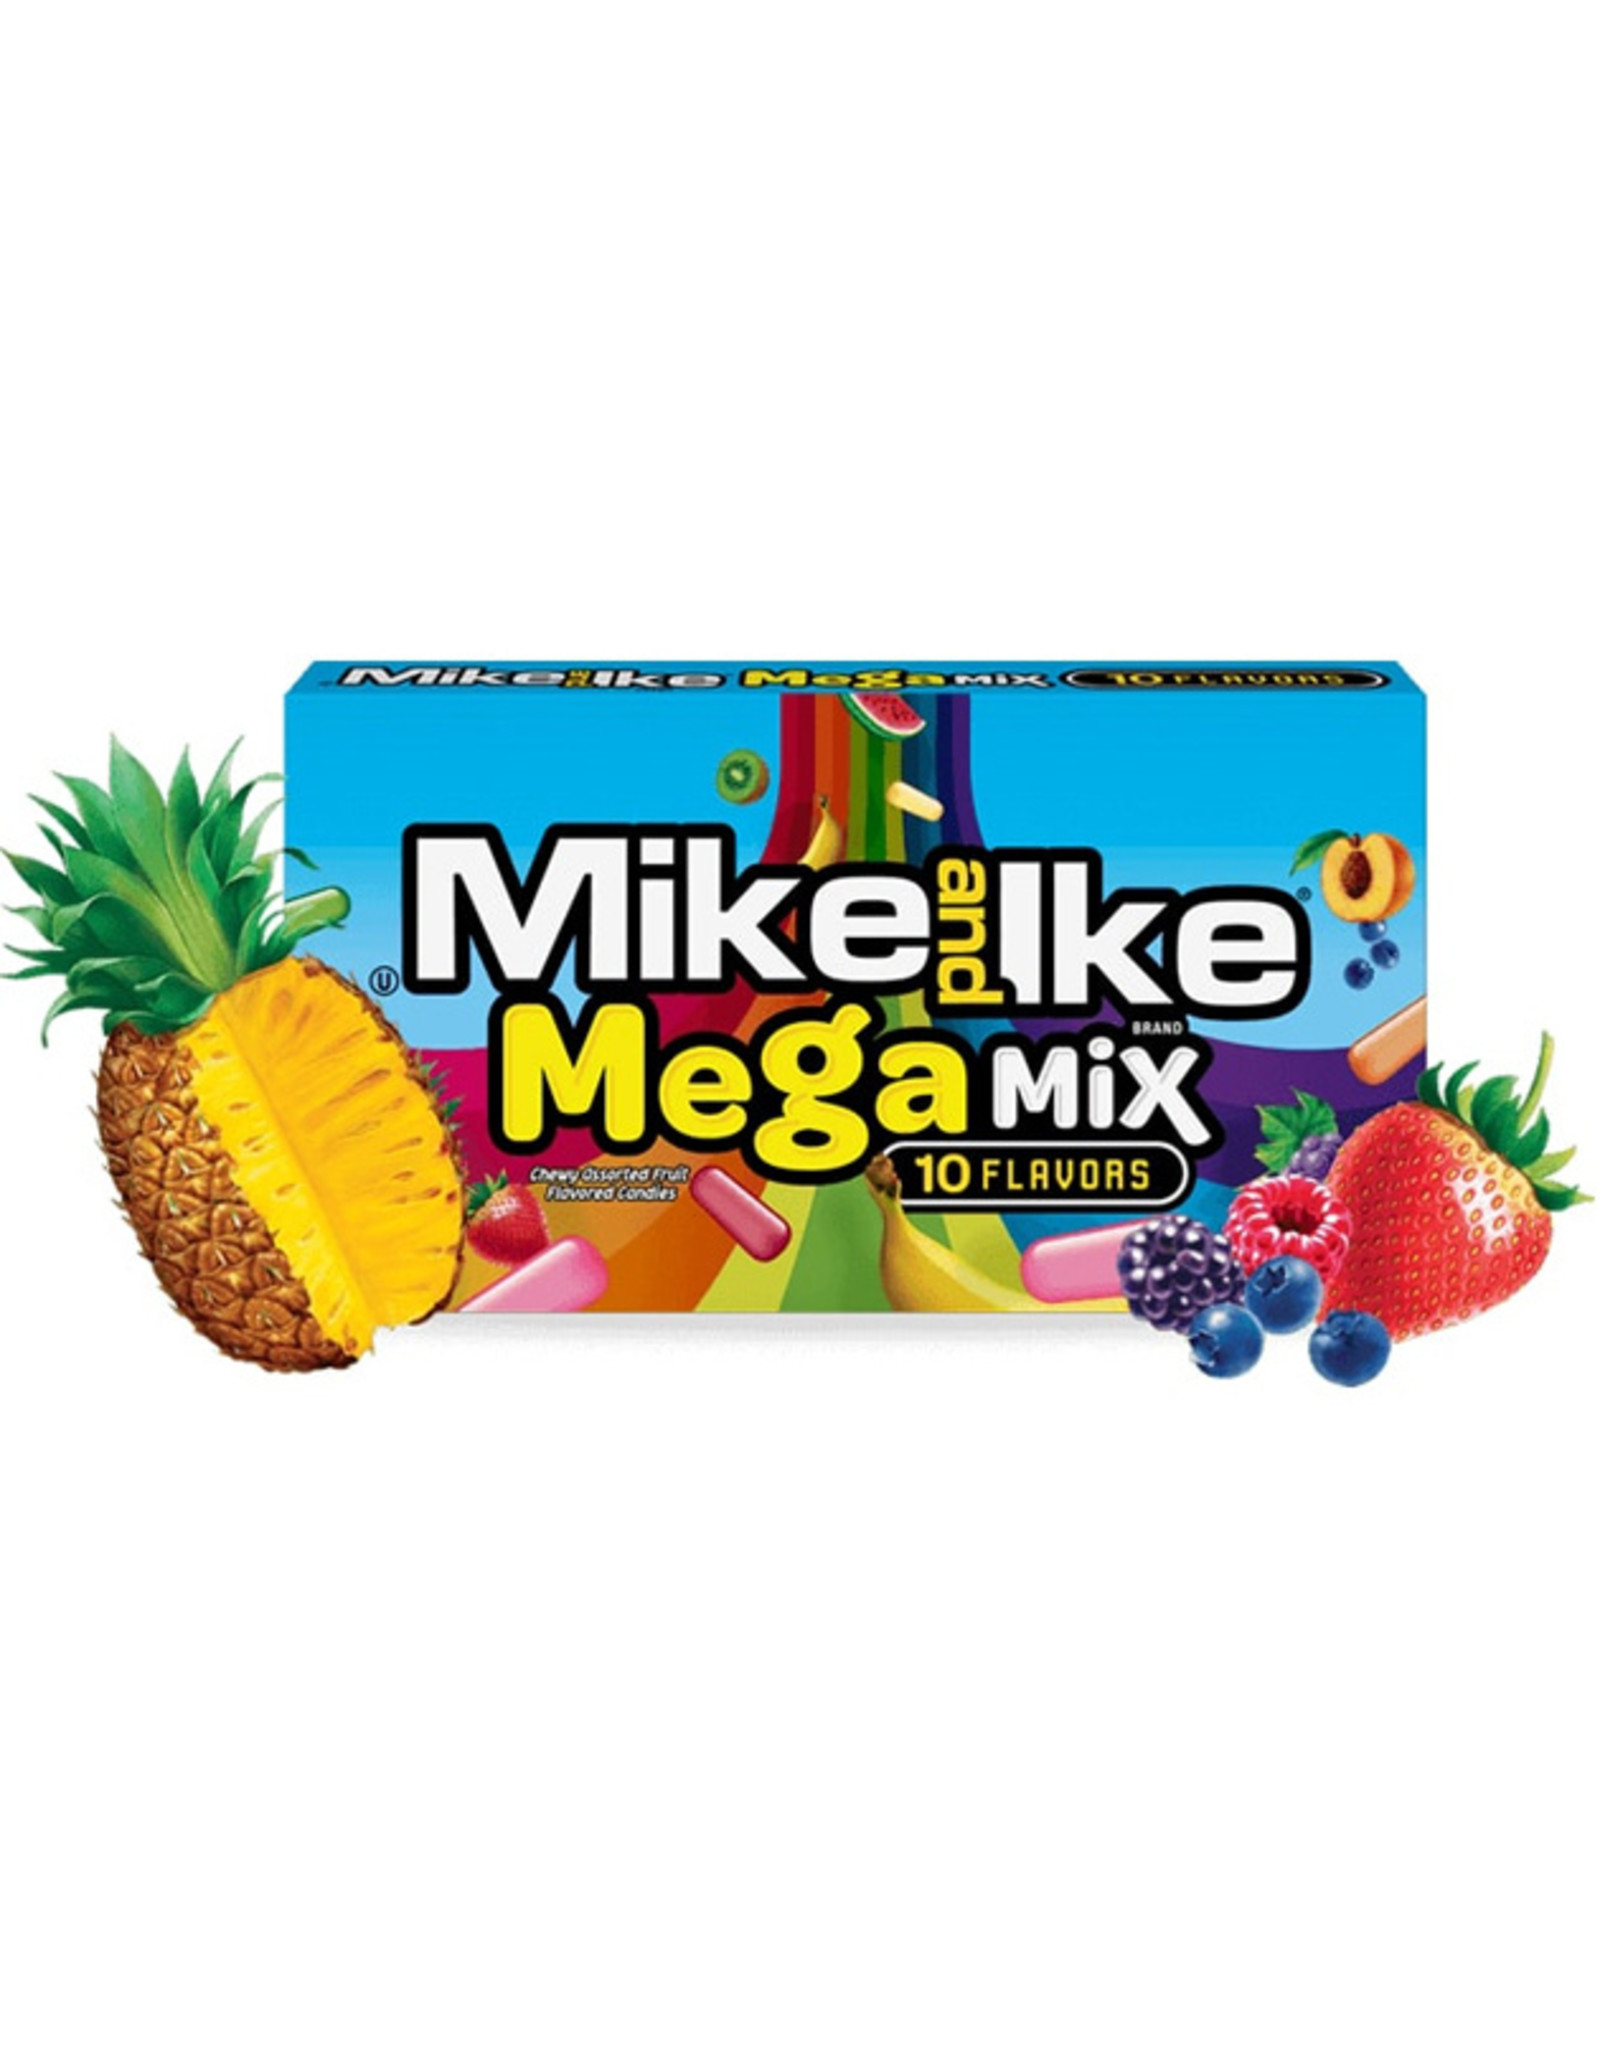 Mike and Ike - Mega Mix - 141g